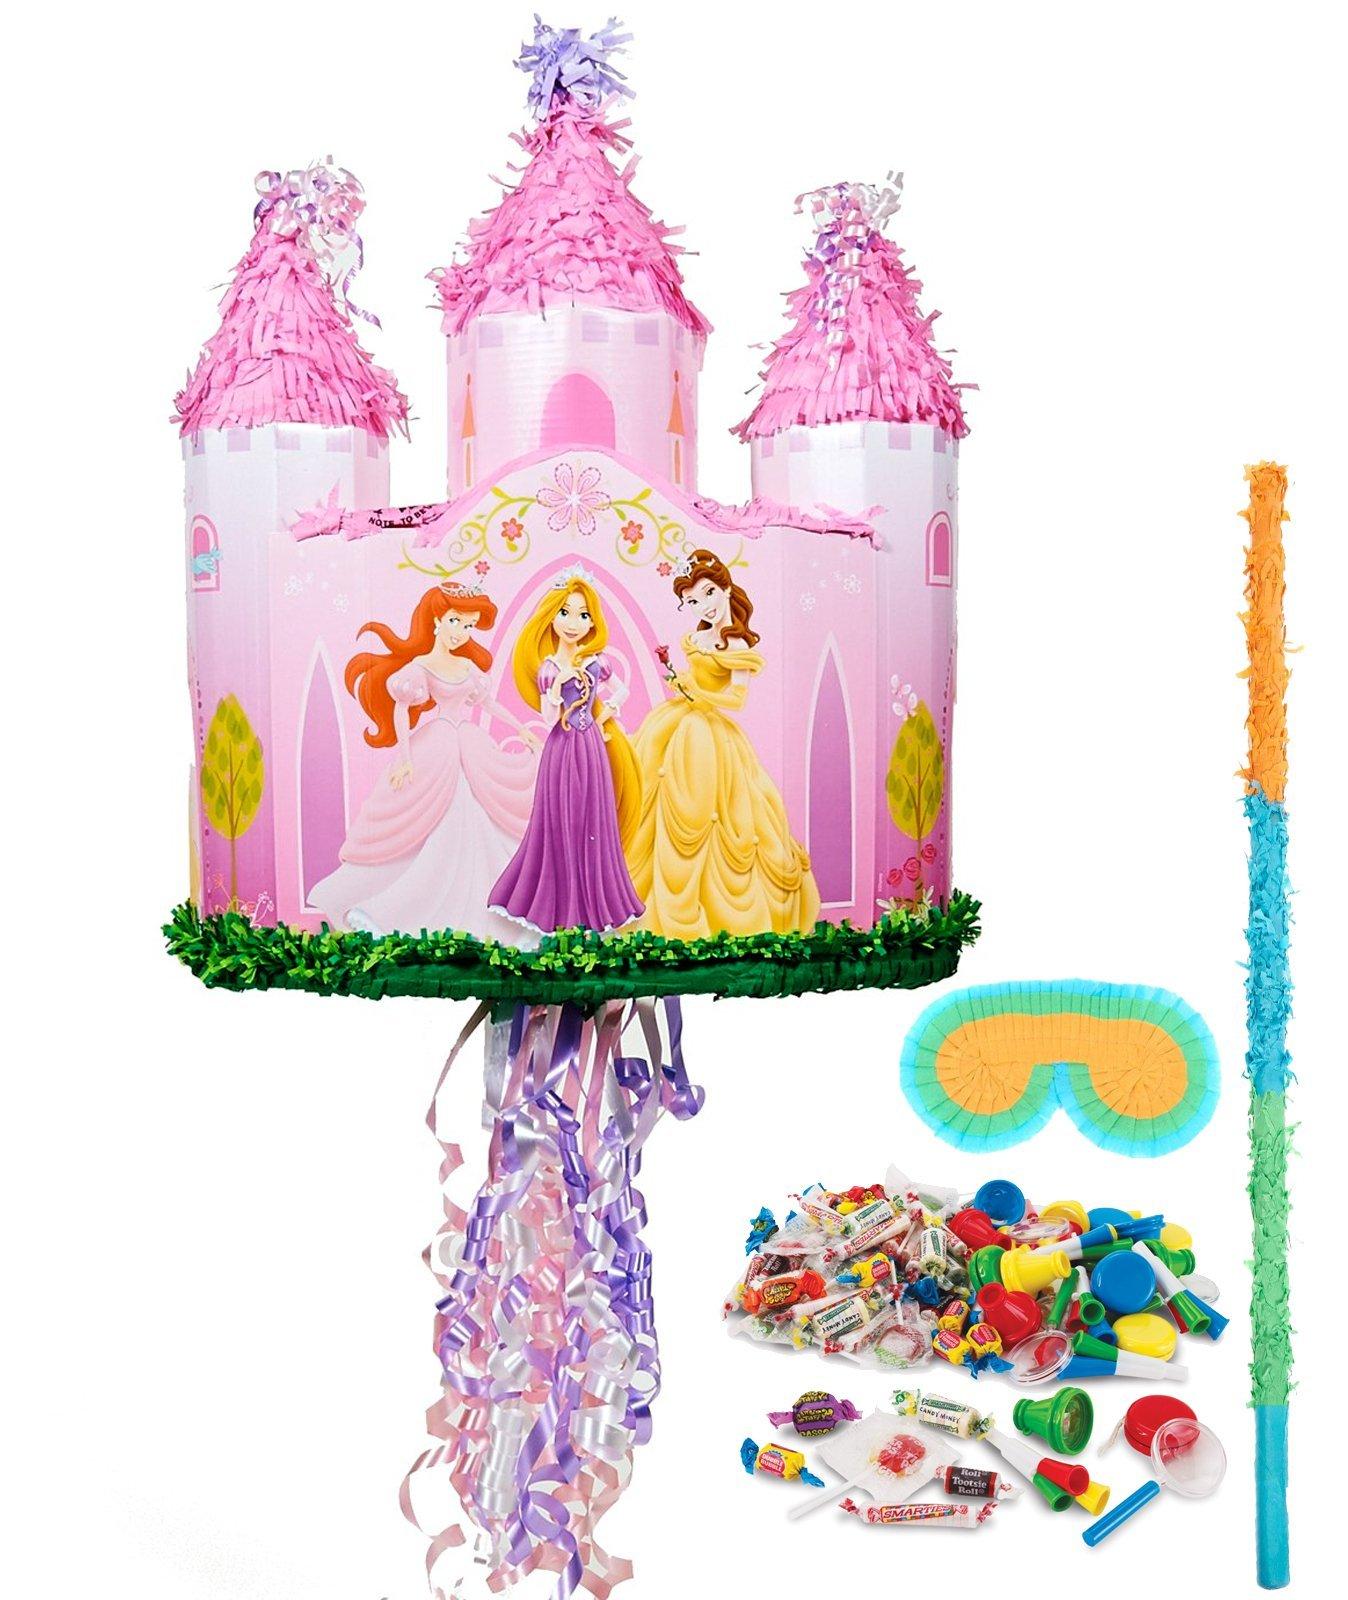 Disney Princess Castle Pull-String Pinata Kit by BirthdayExpress